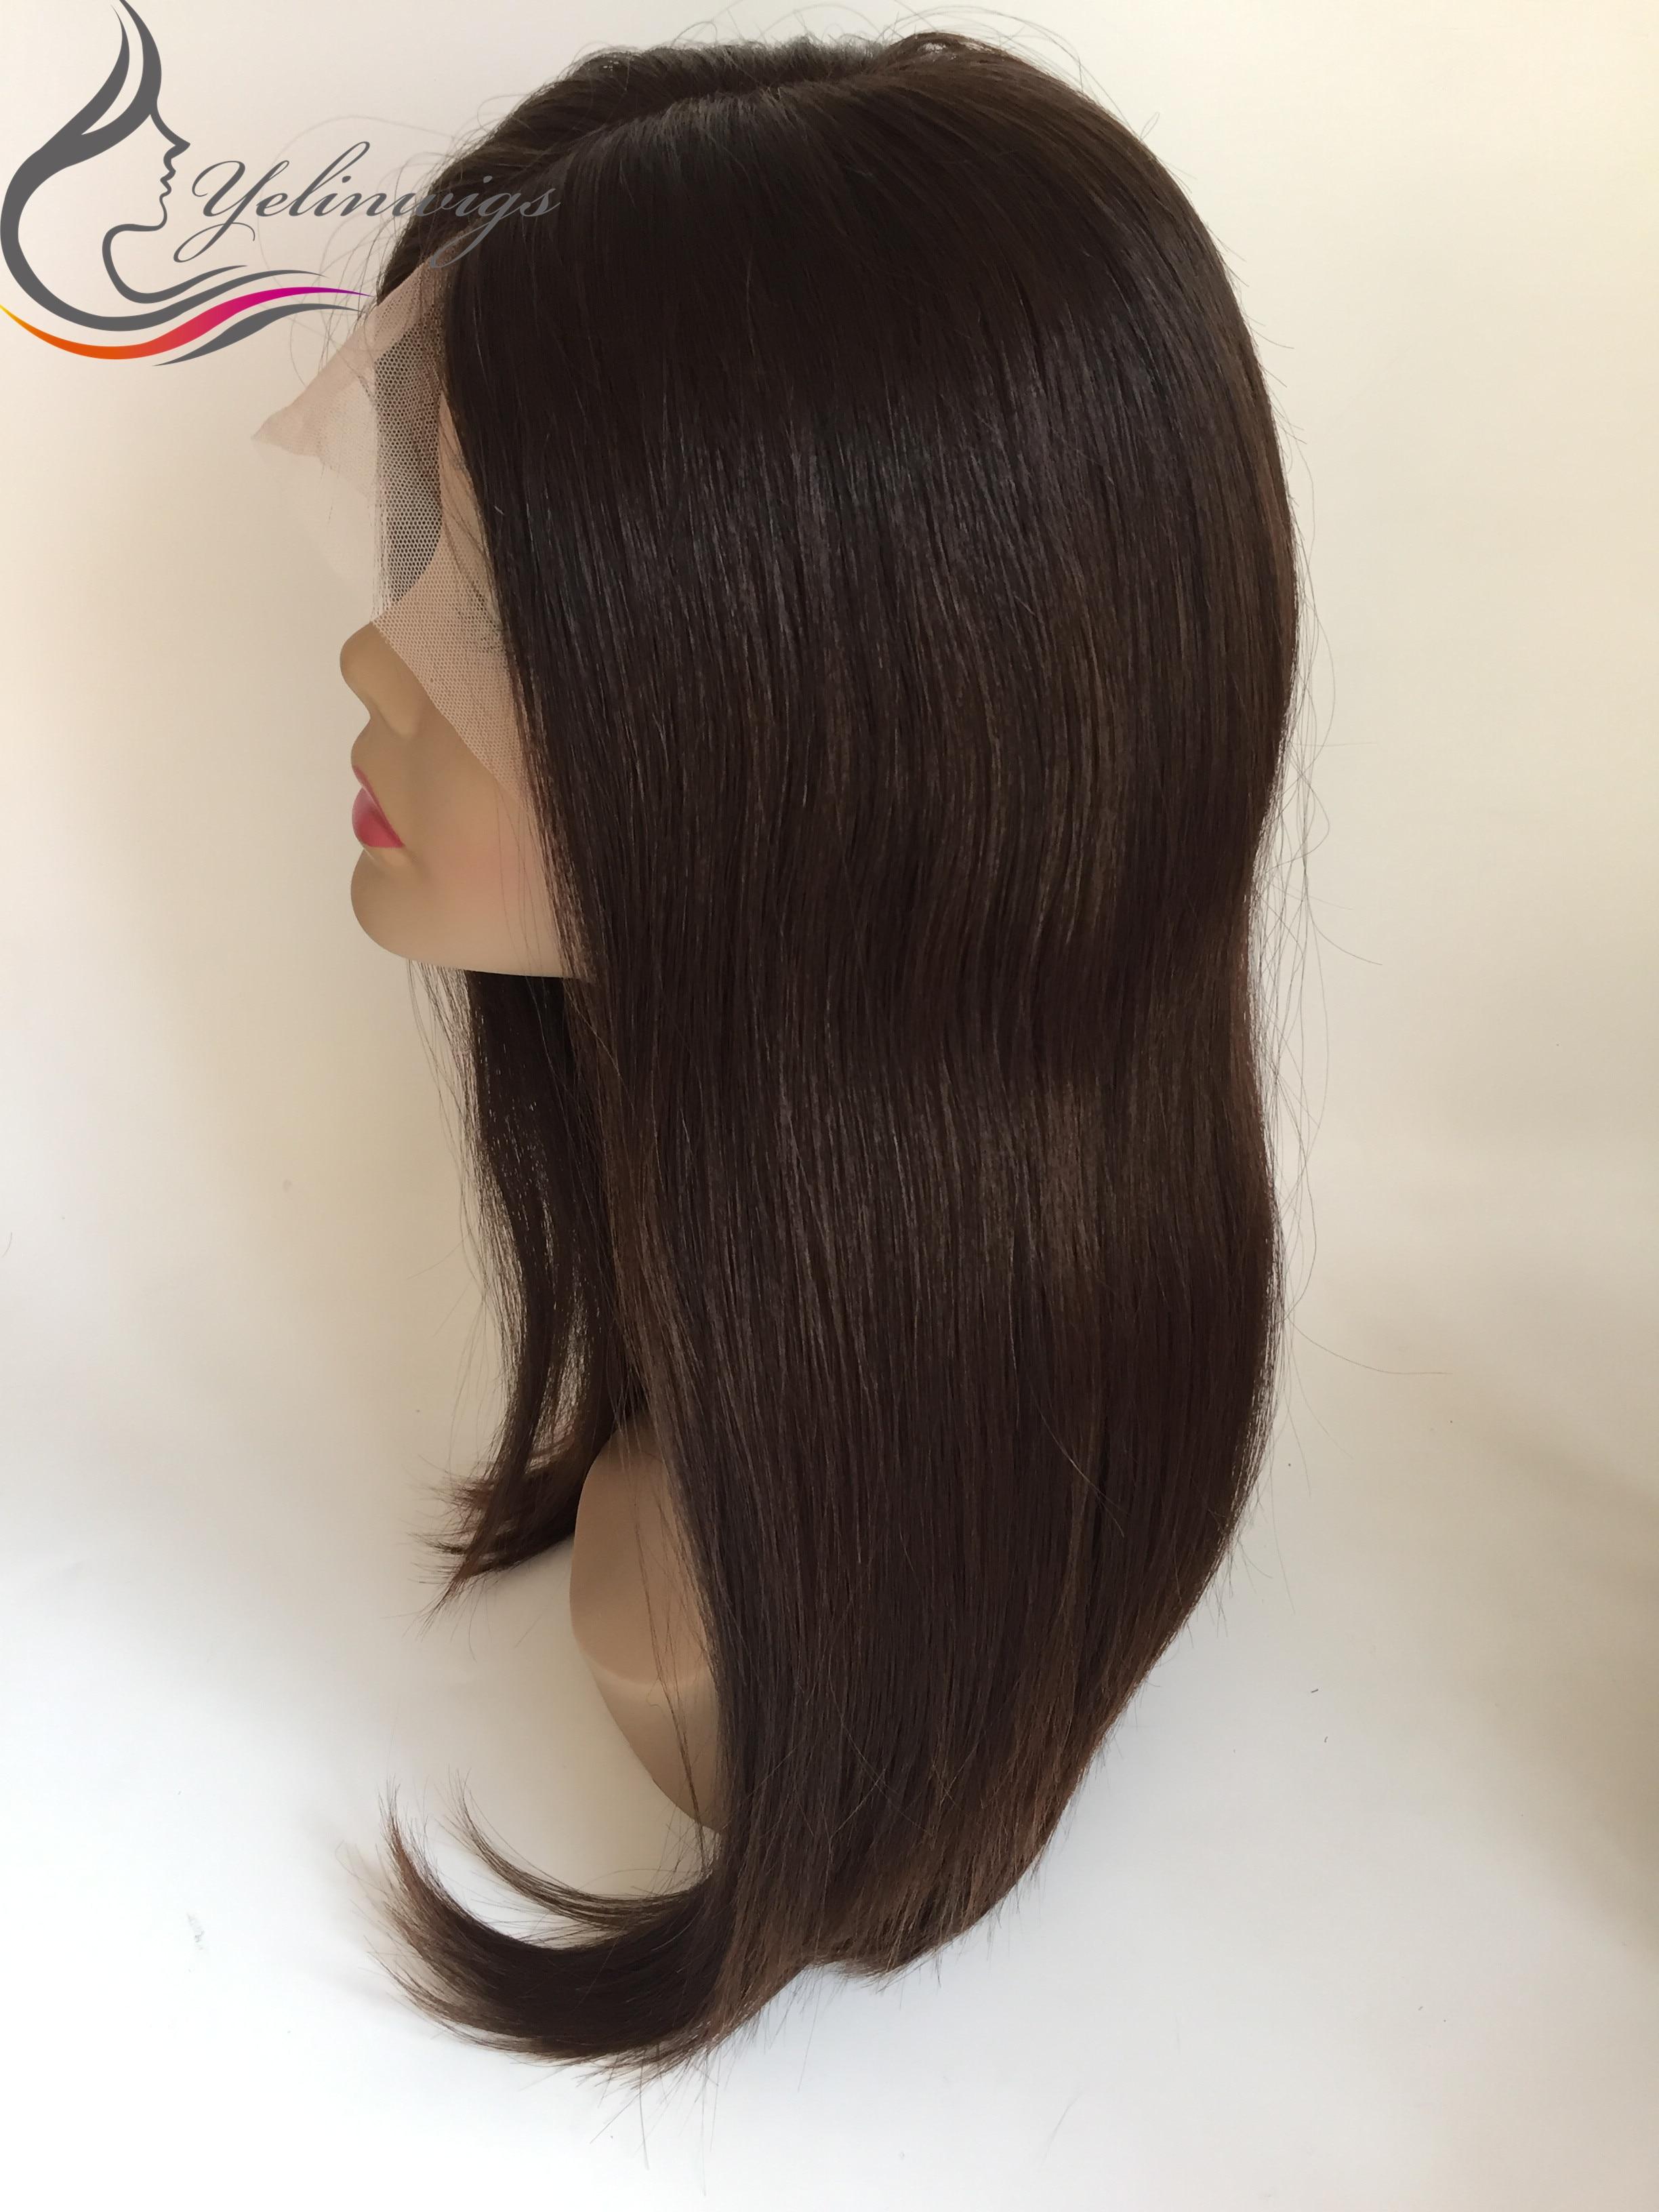 100% European Virgin Hair Lace Top Jewish Wig Kosher Wig High Quality European Hair Wig 22